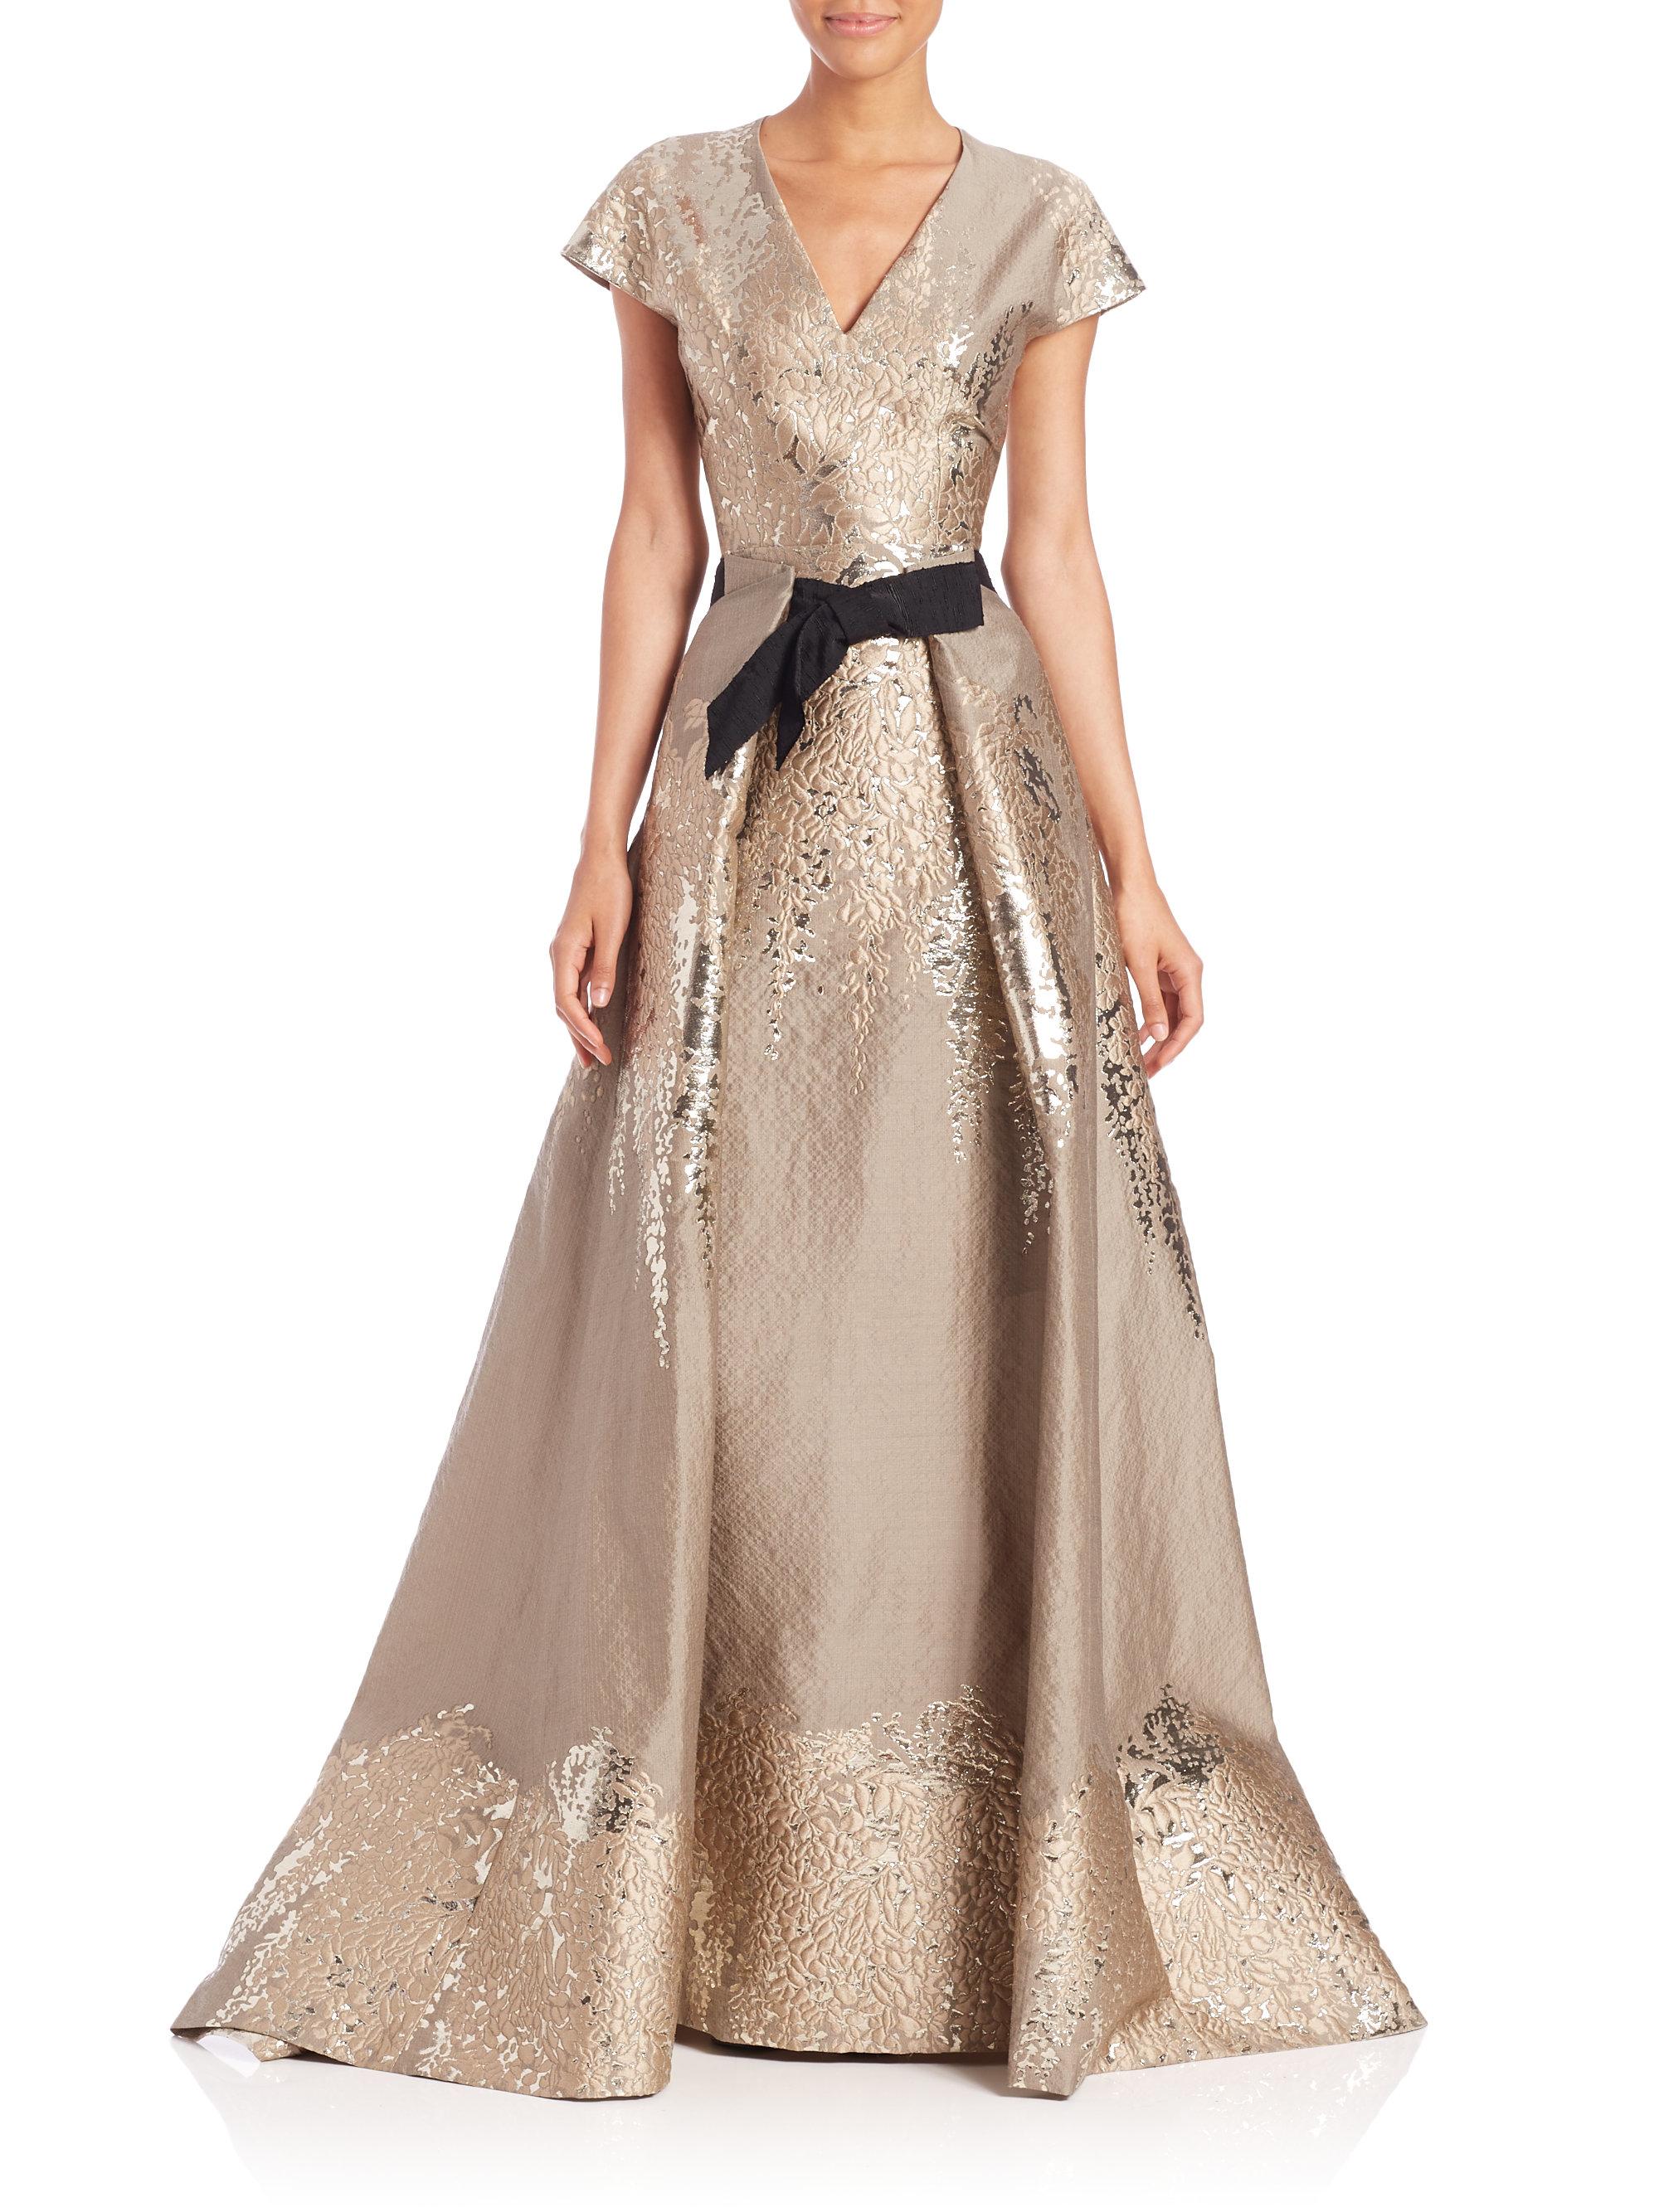 Lyst Carolina Herrera Westeria Metallic Jacquard Gown In Metallic